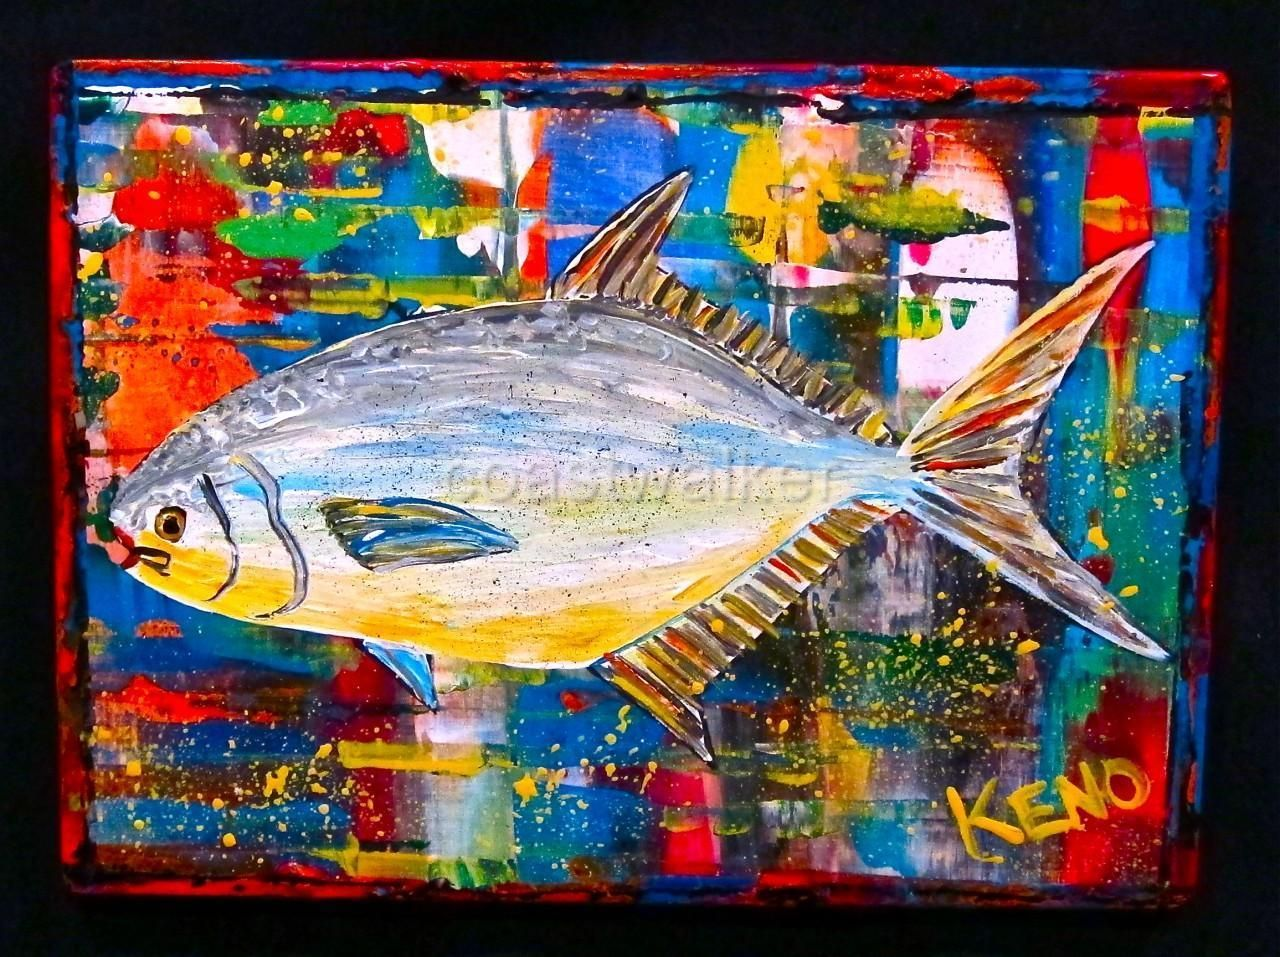 Felix murillo lleno de colores painting acrylic artwork fish art -  Pompano Fish Painting Maine Abstract Folk Art Outsider Coastwalker Ebay